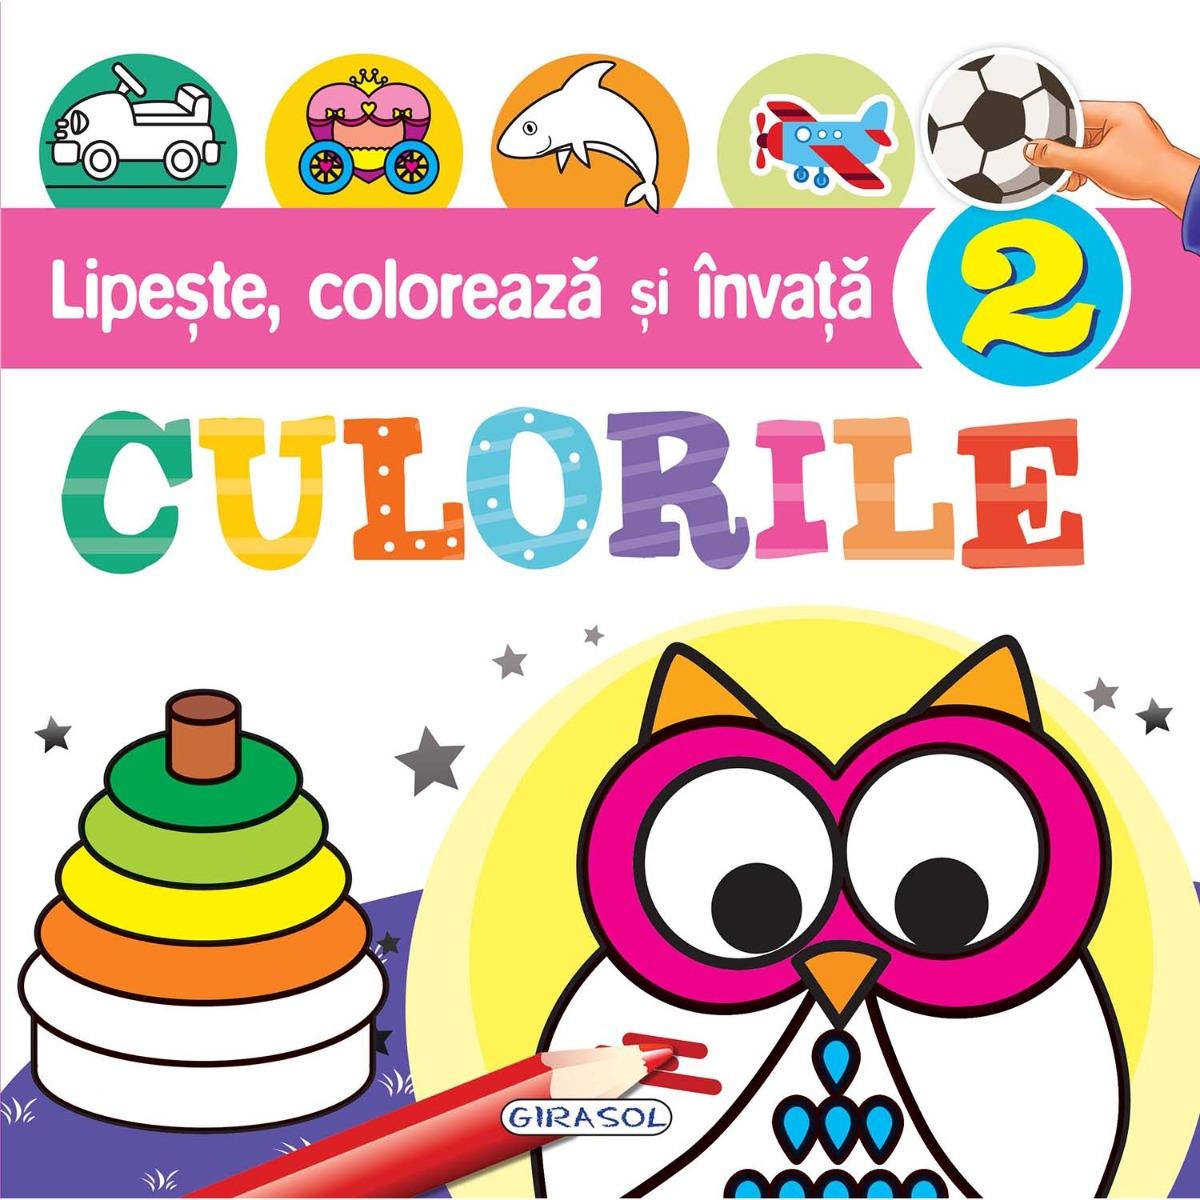 Carte editura Girasol, Lipeste, coloreaza si invata culorile 2 imagine 2021